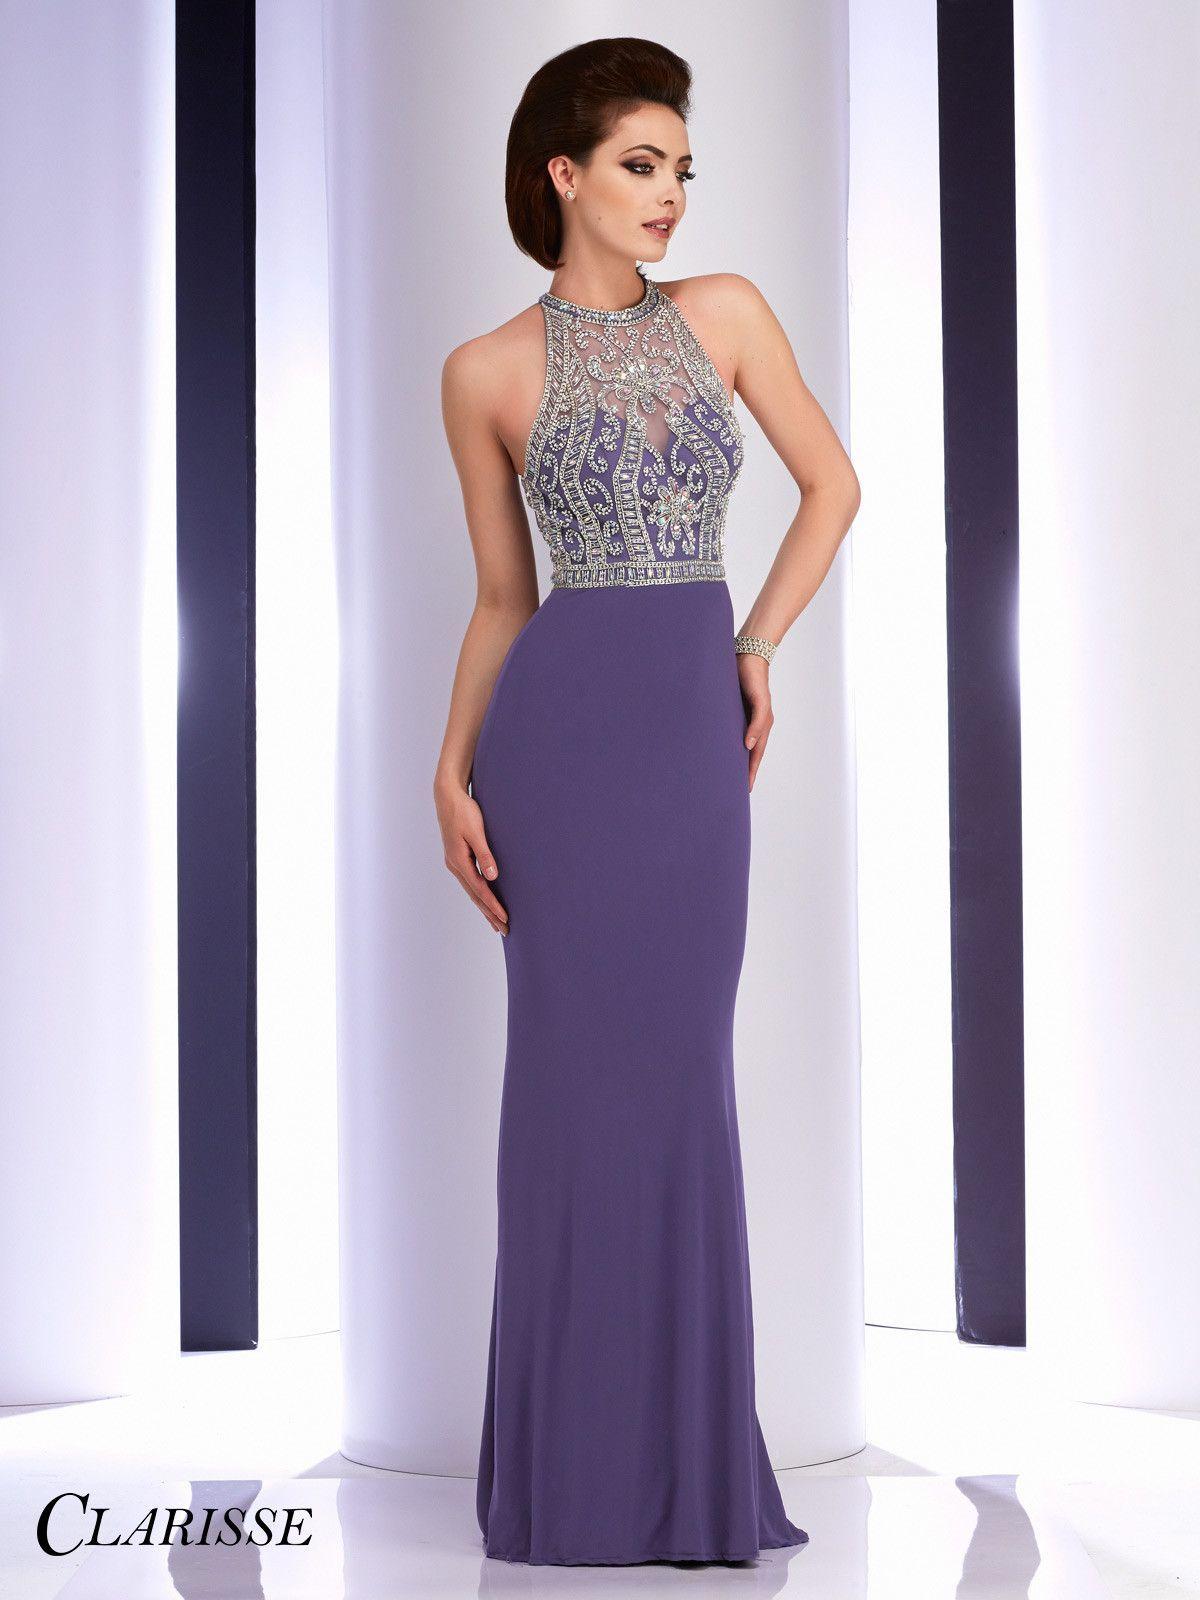 Clarisse Prom 2807 Smoke Prom Dress | Vestiditos